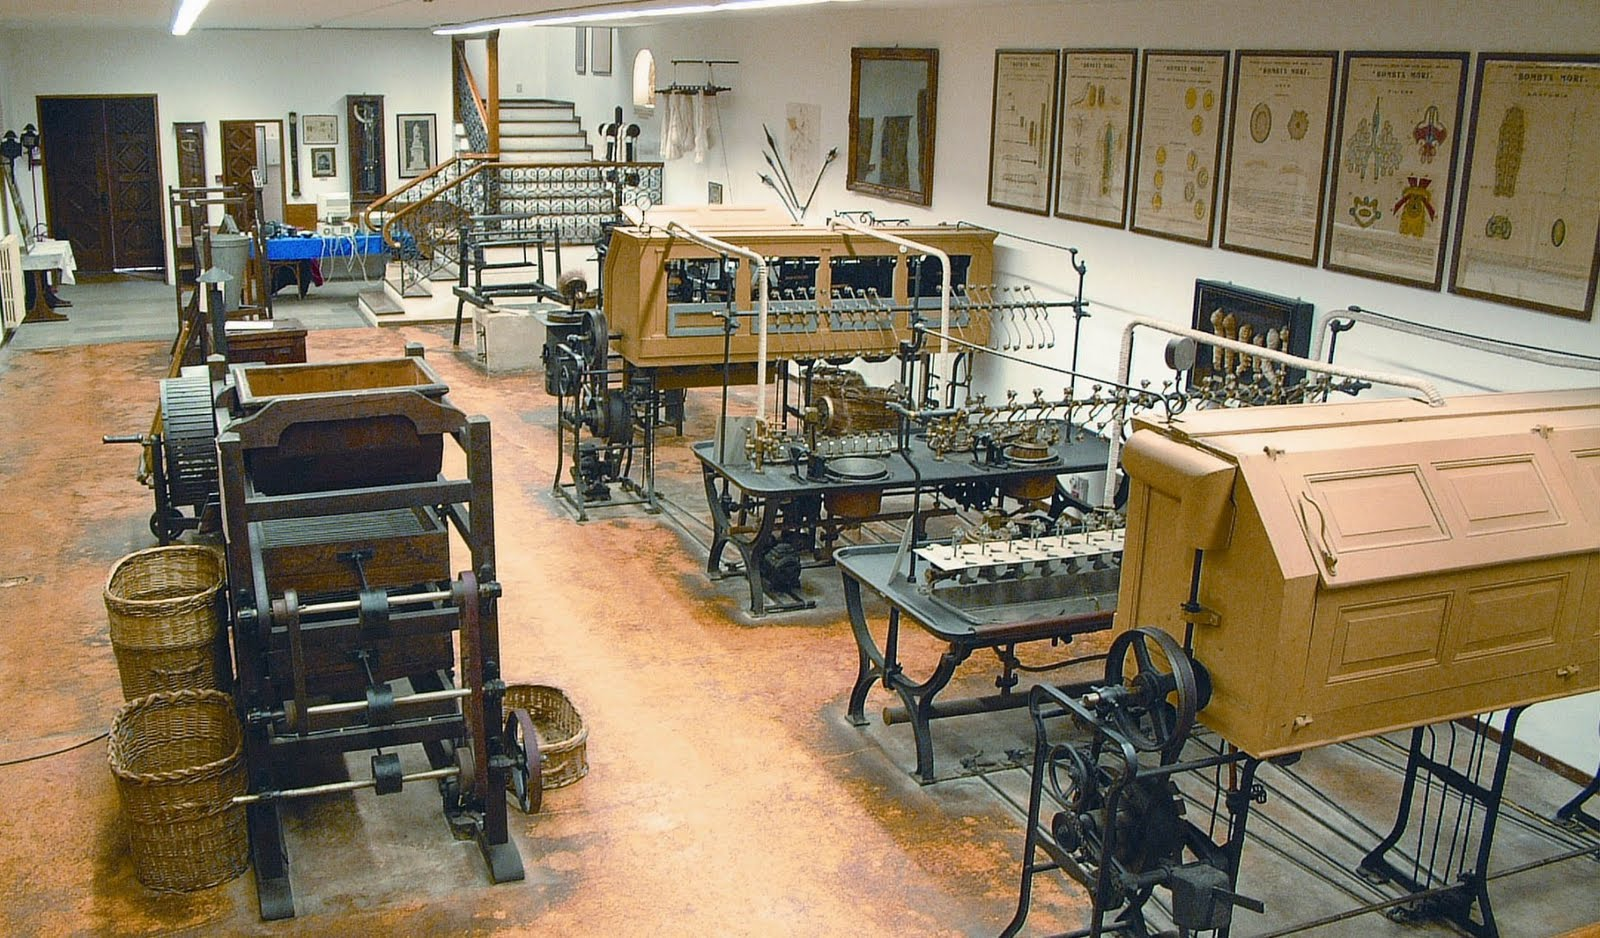 Archeologia industriale lecchese e comasca